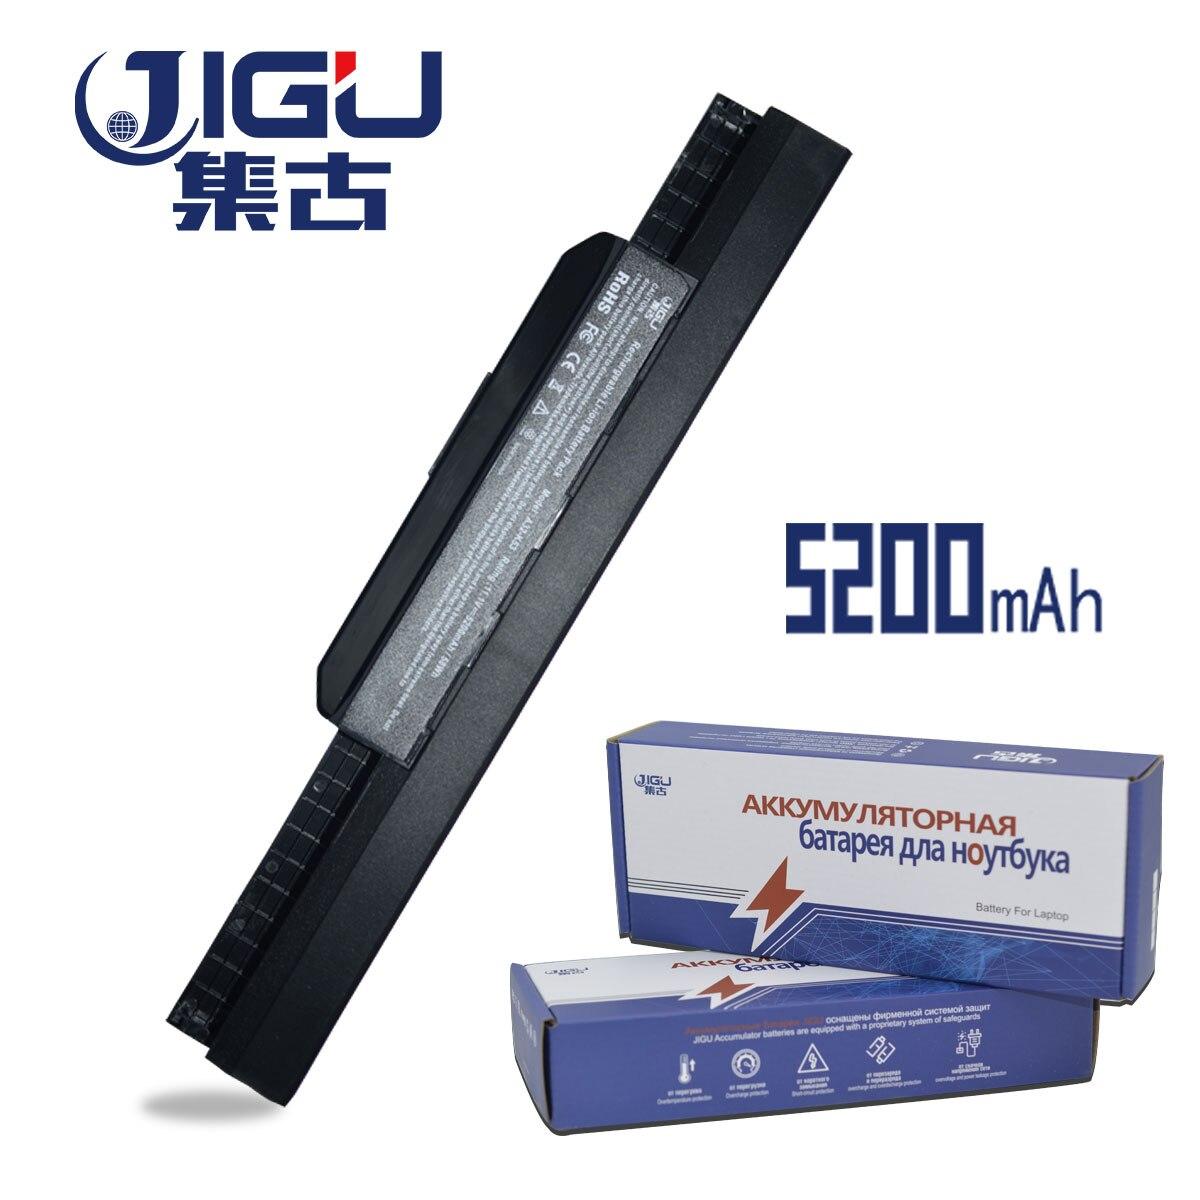 JIGU 5200 MAH Laptop Battery For Asus 6 CELLS A31-K53 A32-K53 A41-K53 A42-K53 A43 A53 A54 A83 K43 K53 P43 P53 X43 X44